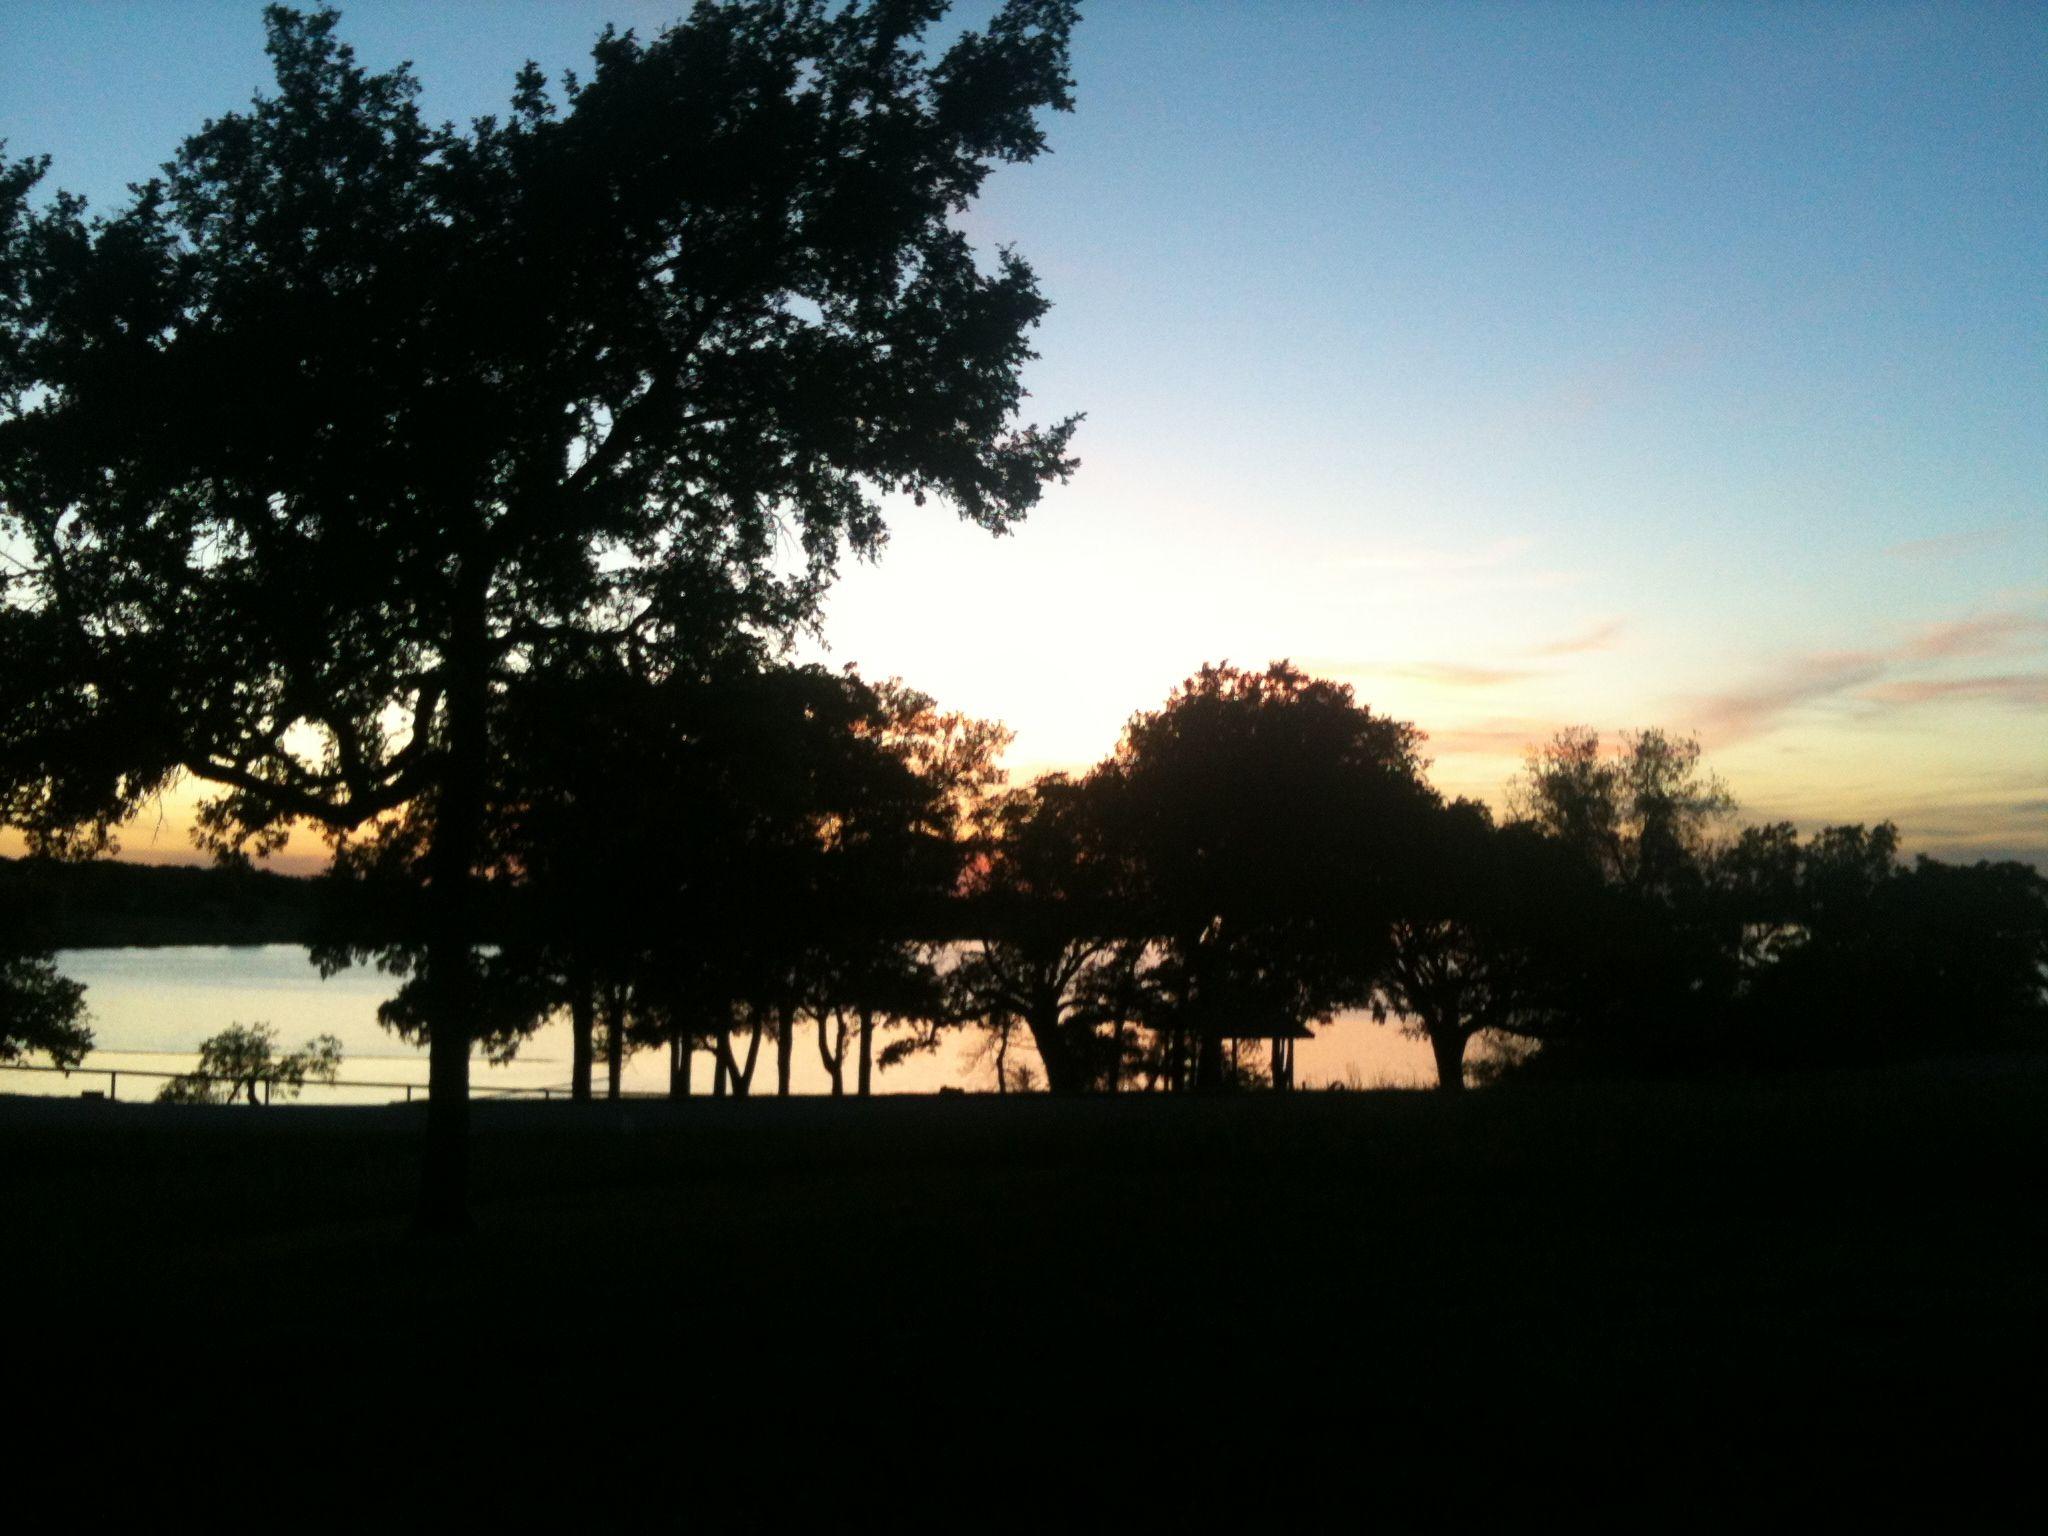 Sunset on the lake :)